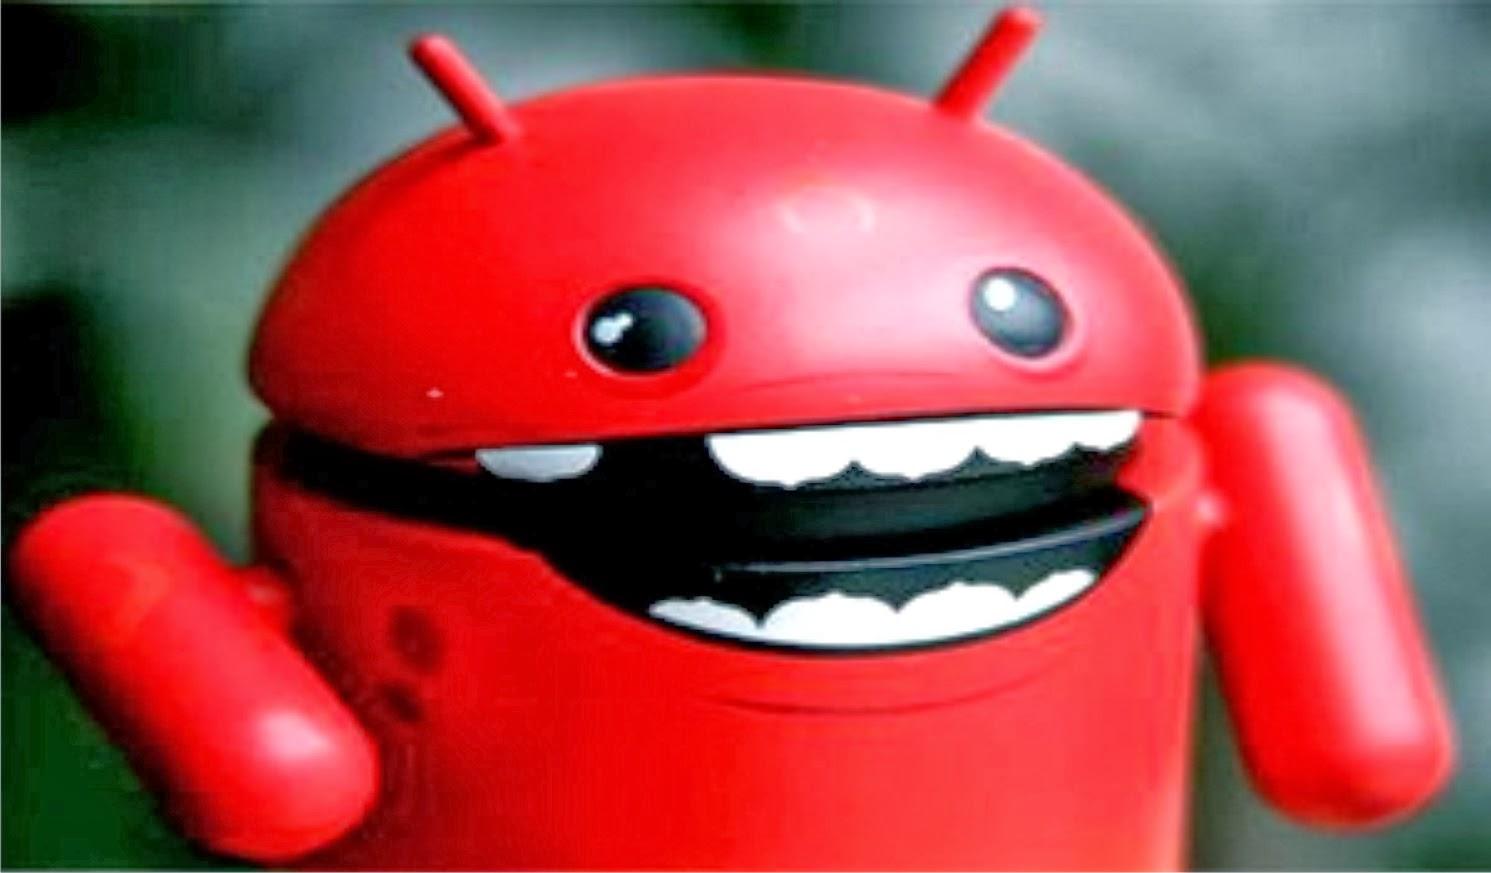 Malware Jenis Bootkit Di Android